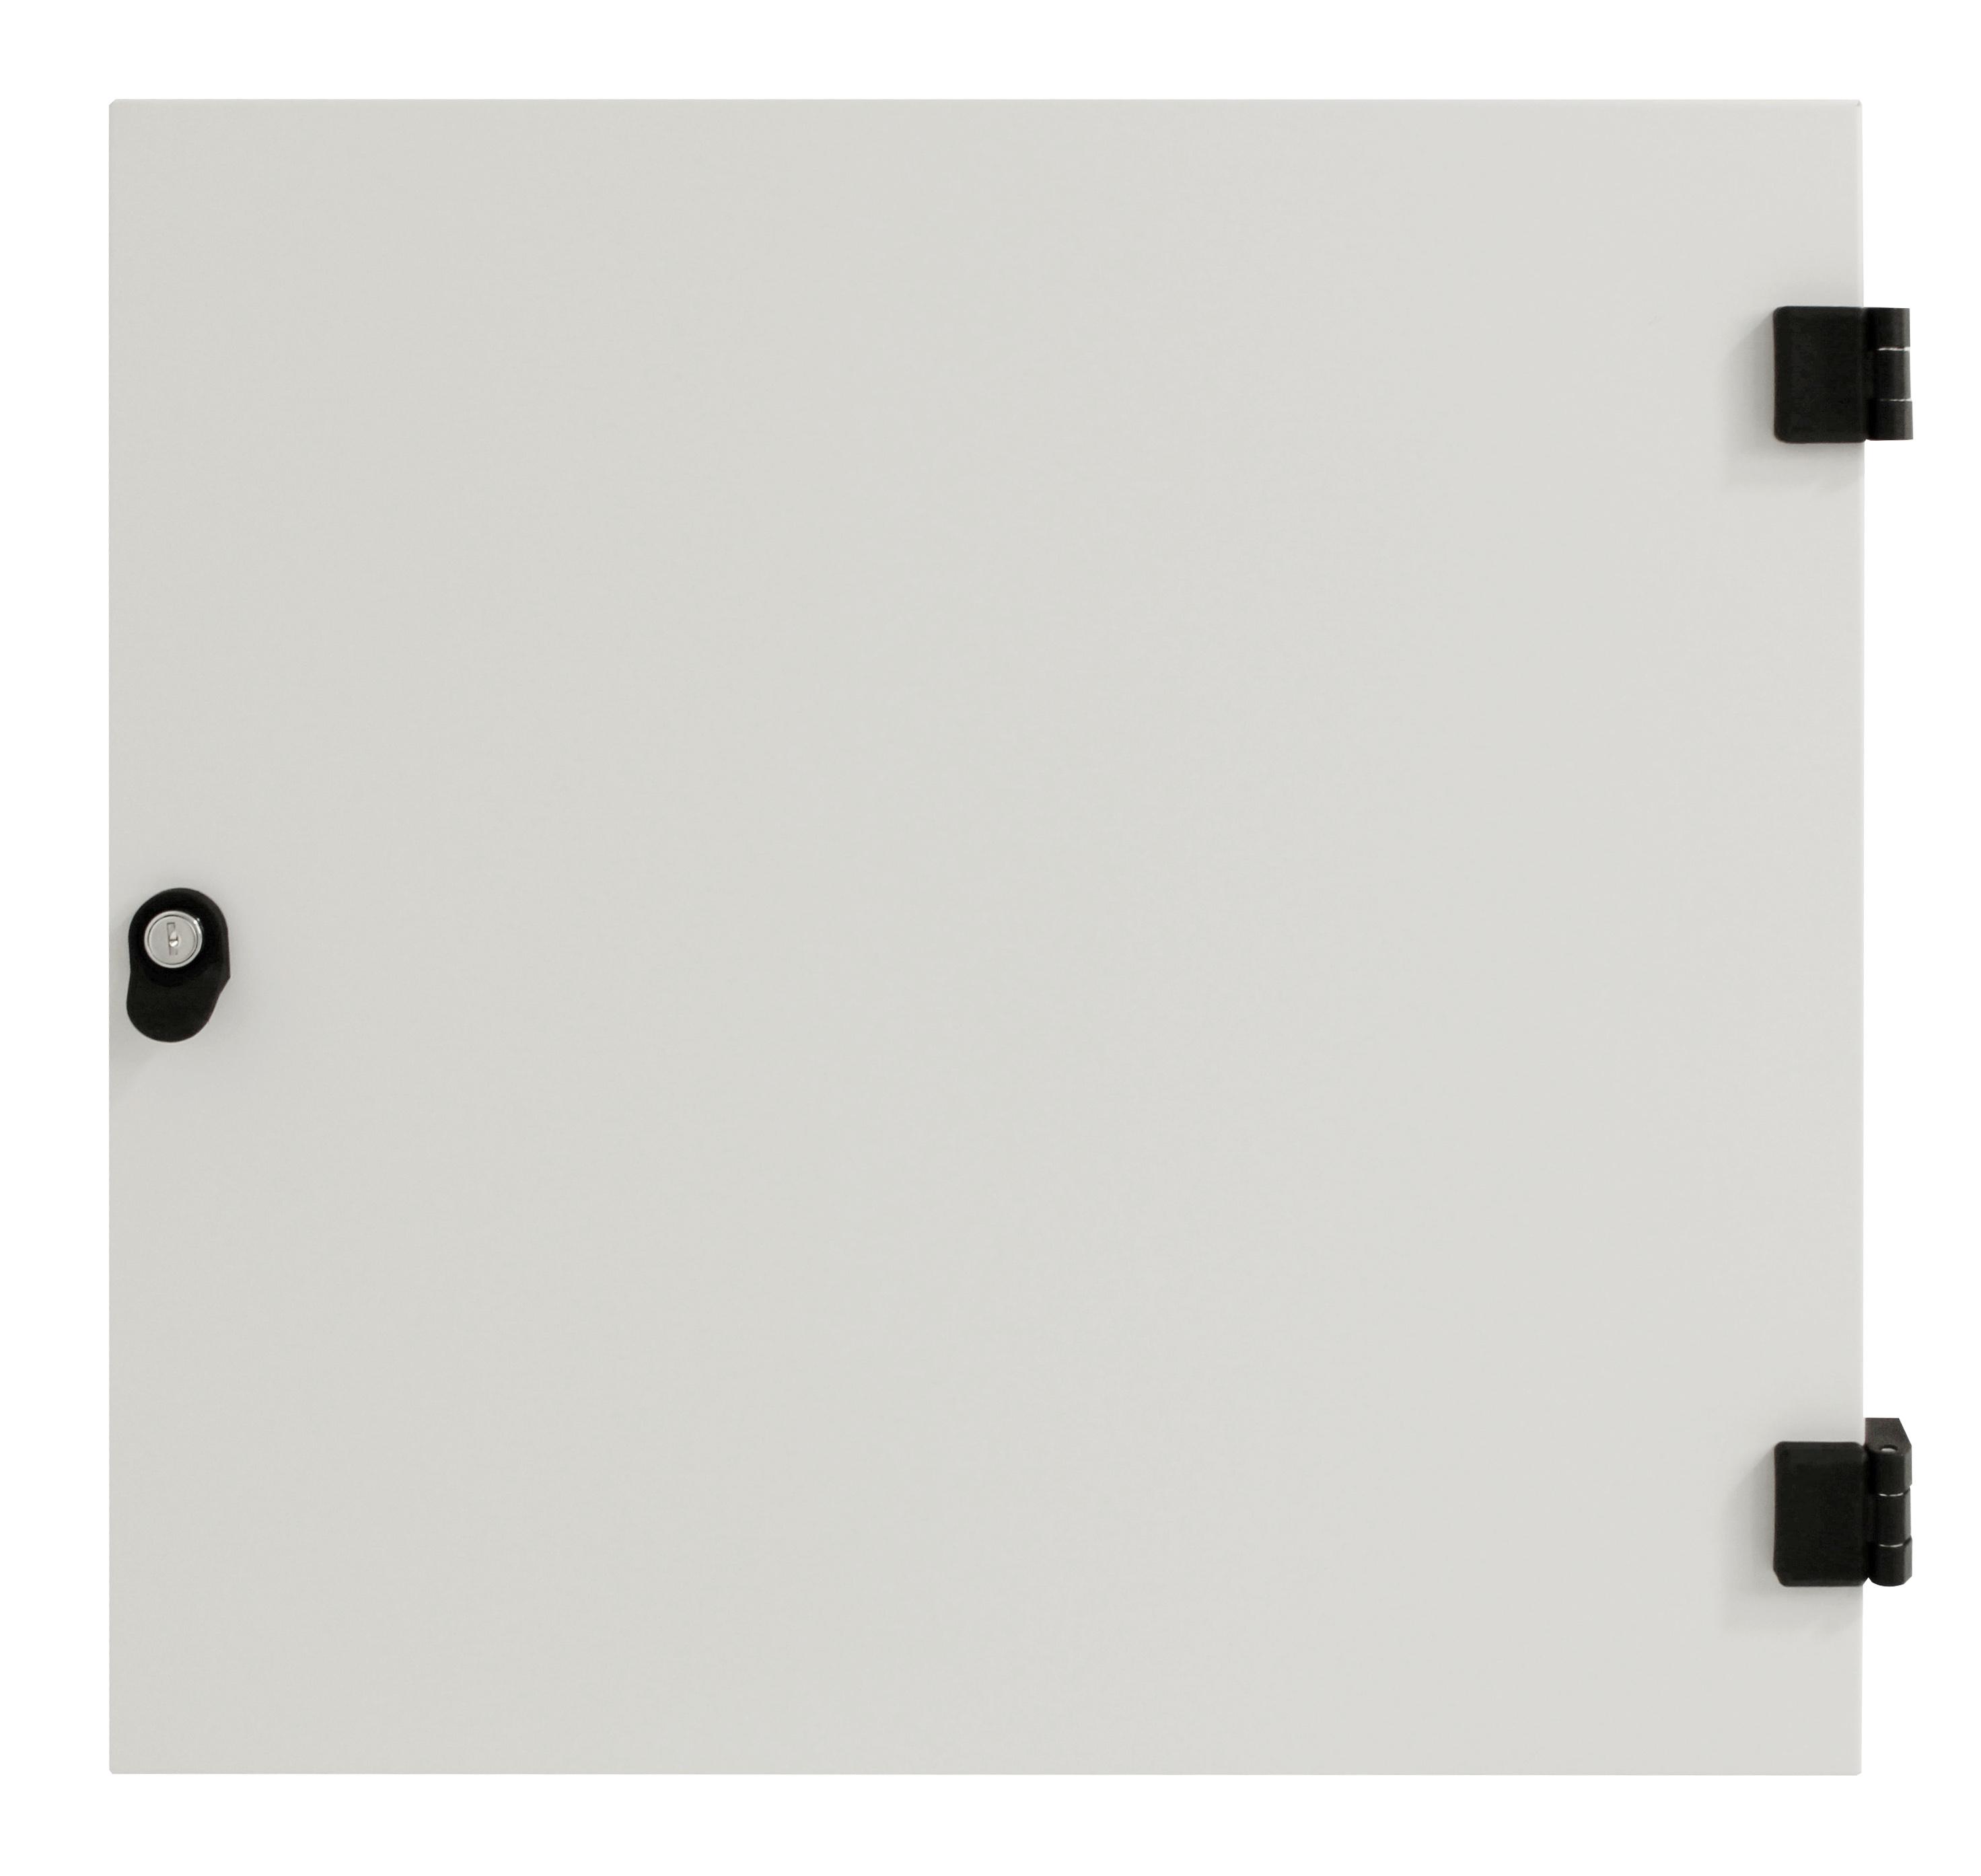 1 Stk Metall-Tür voll für DW-Schrank 9HE, B=600, RAL7035 DWRT0960--